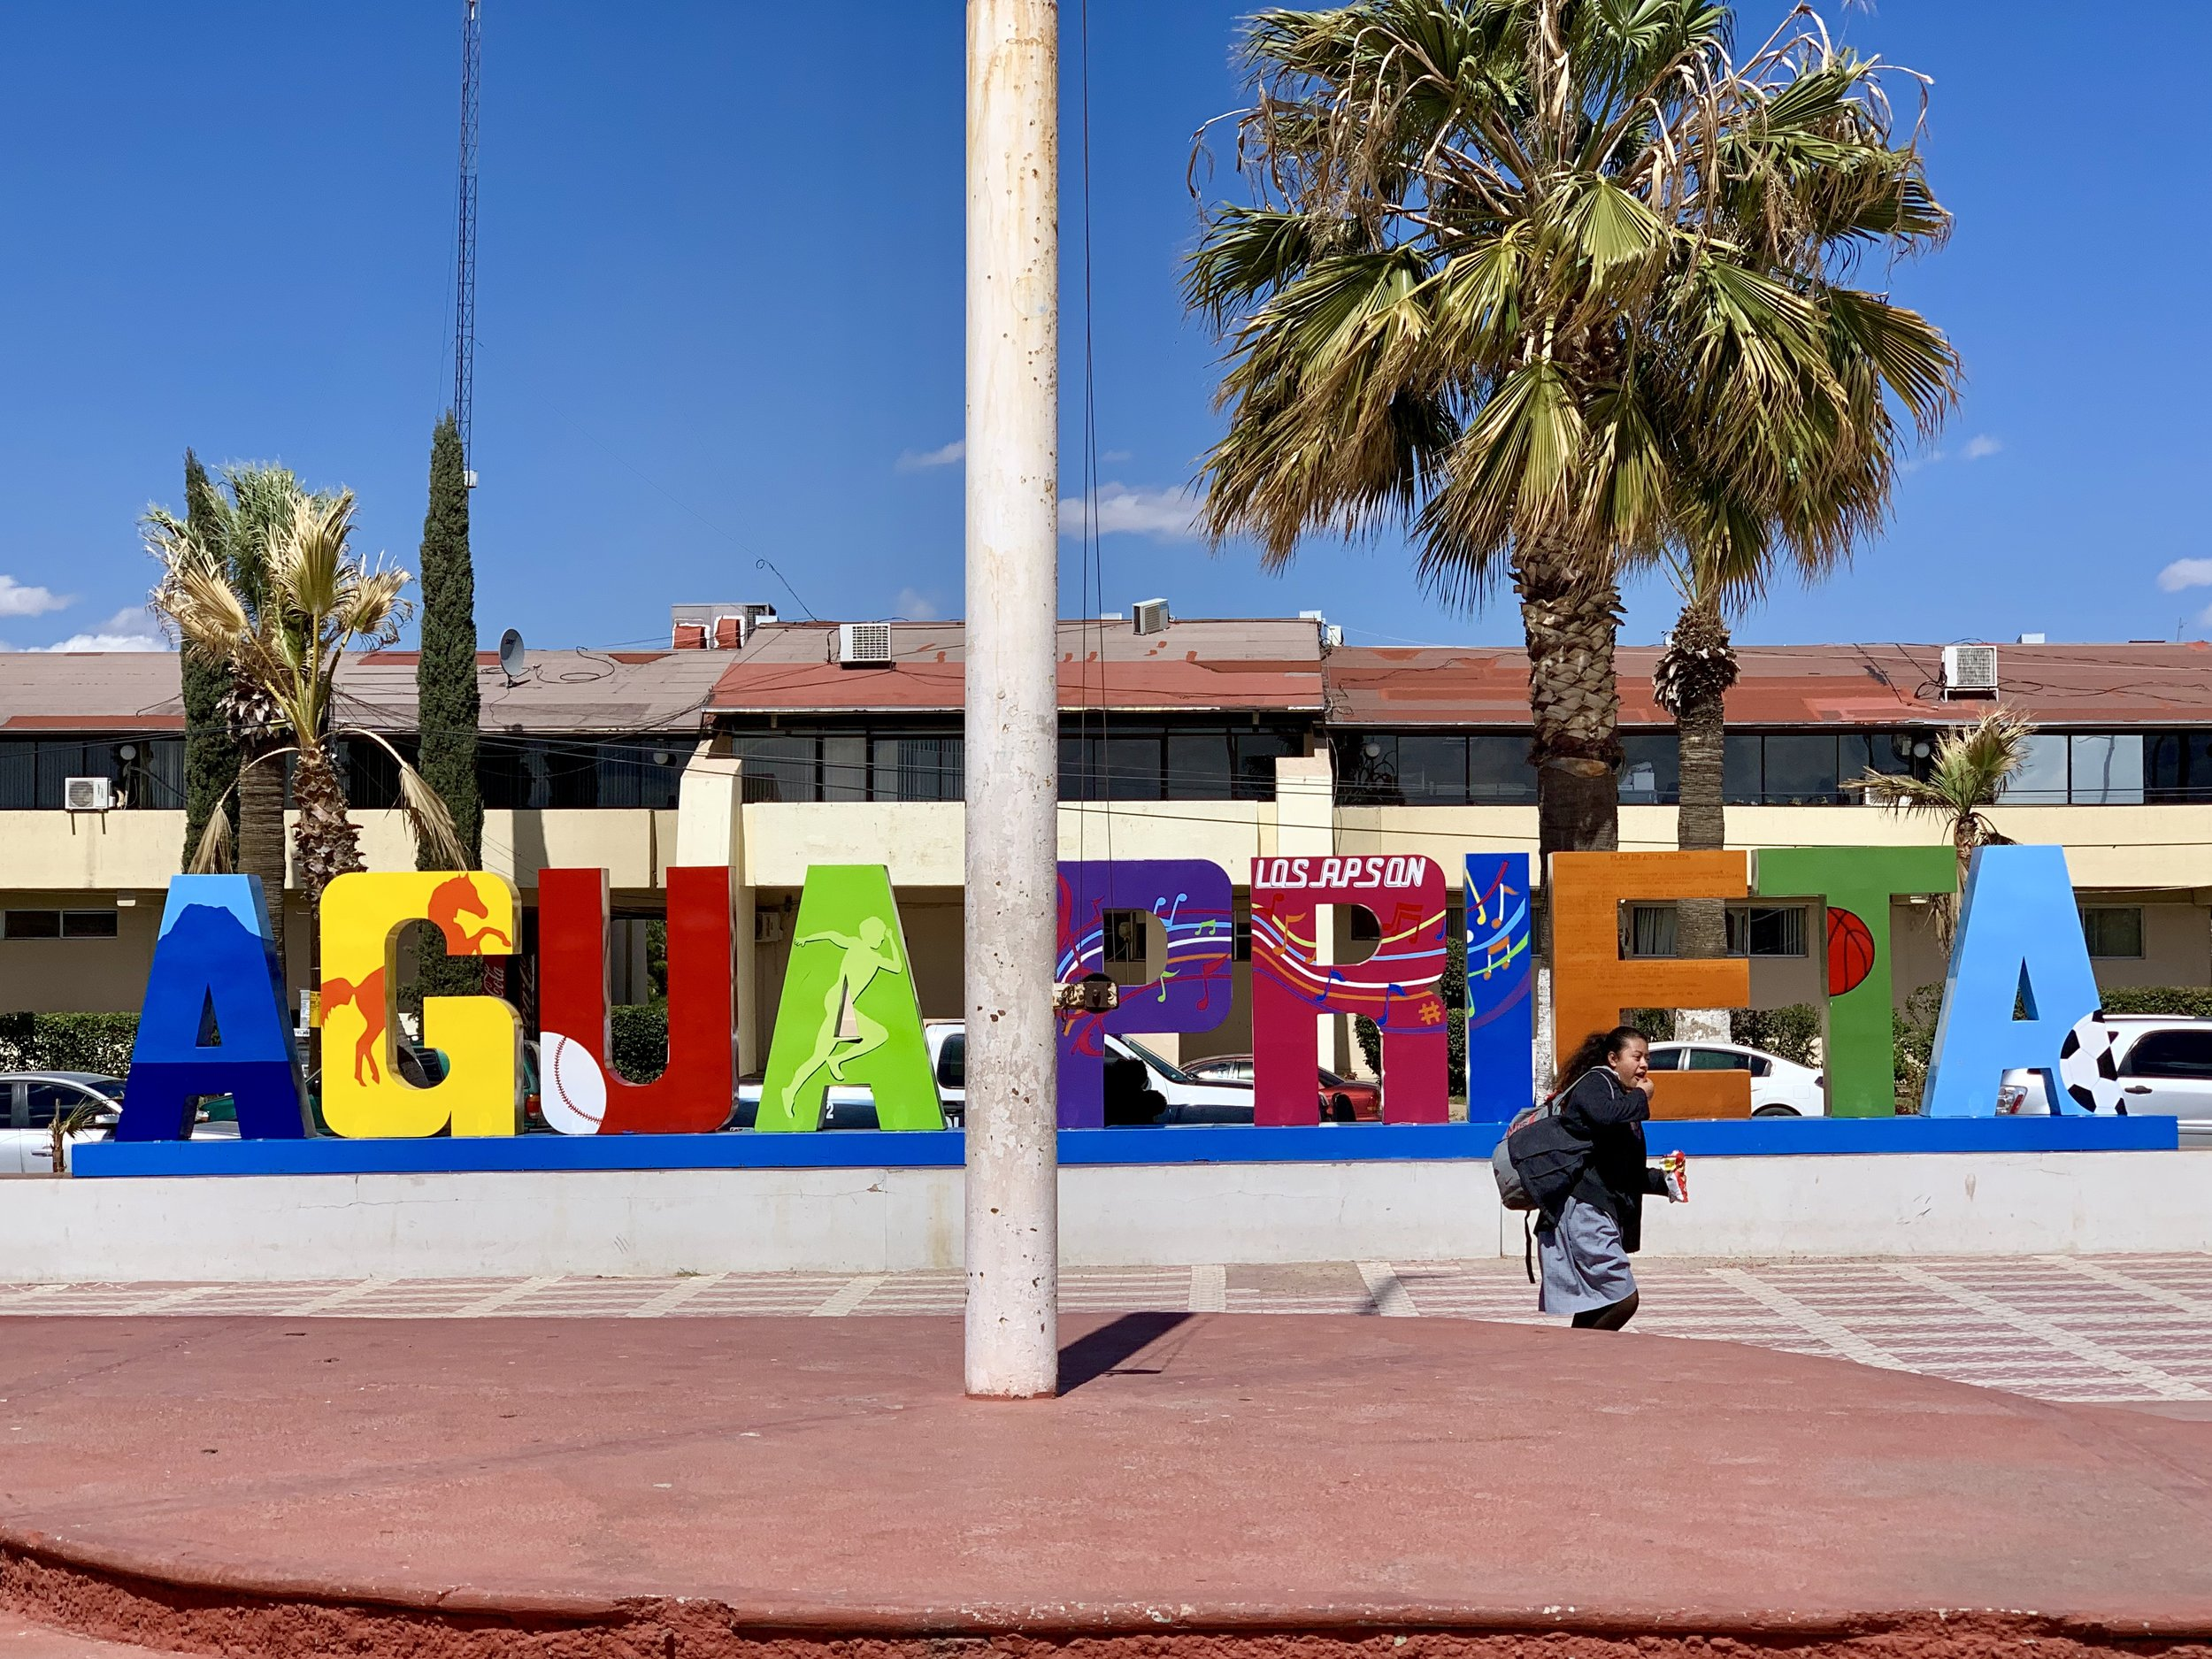 The main square in Agua Prieta.